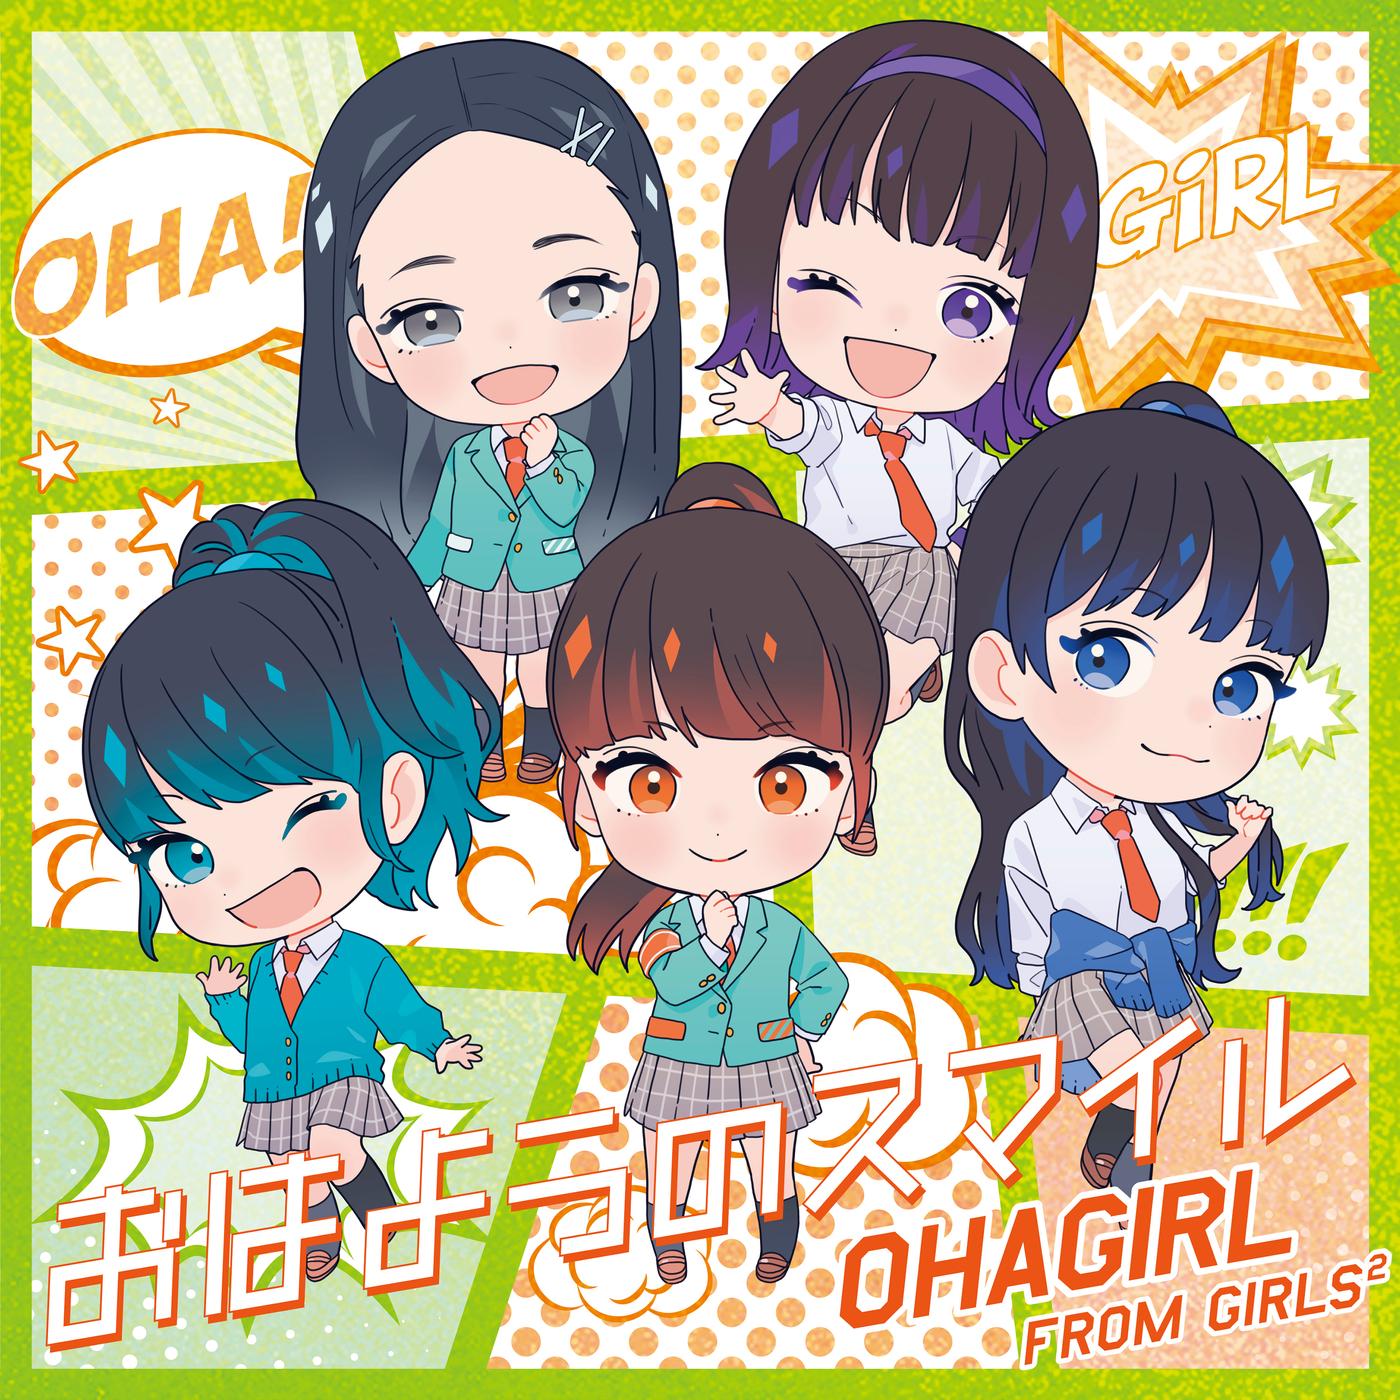 Ohayo No Smile - Oha Girl from Girls2